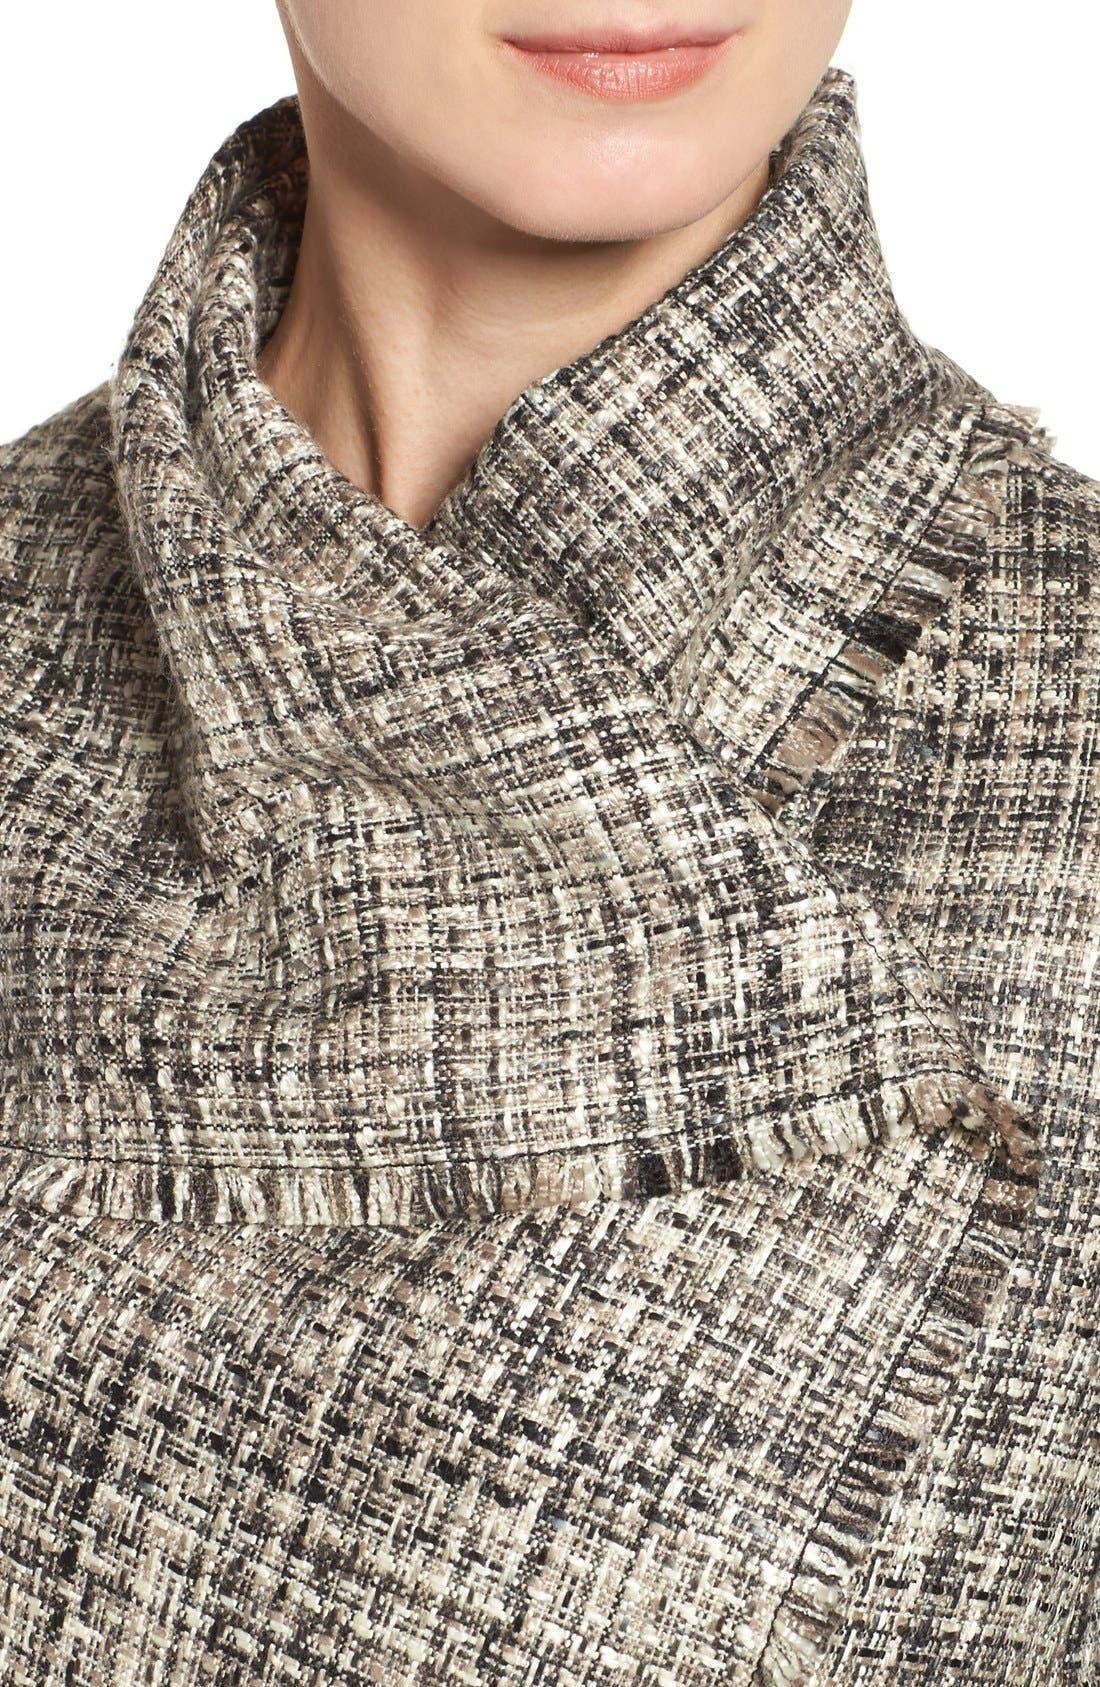 ANNE KLEIN,                             Mixed Media Drape Front Jacket,                             Alternate thumbnail 5, color,                             001